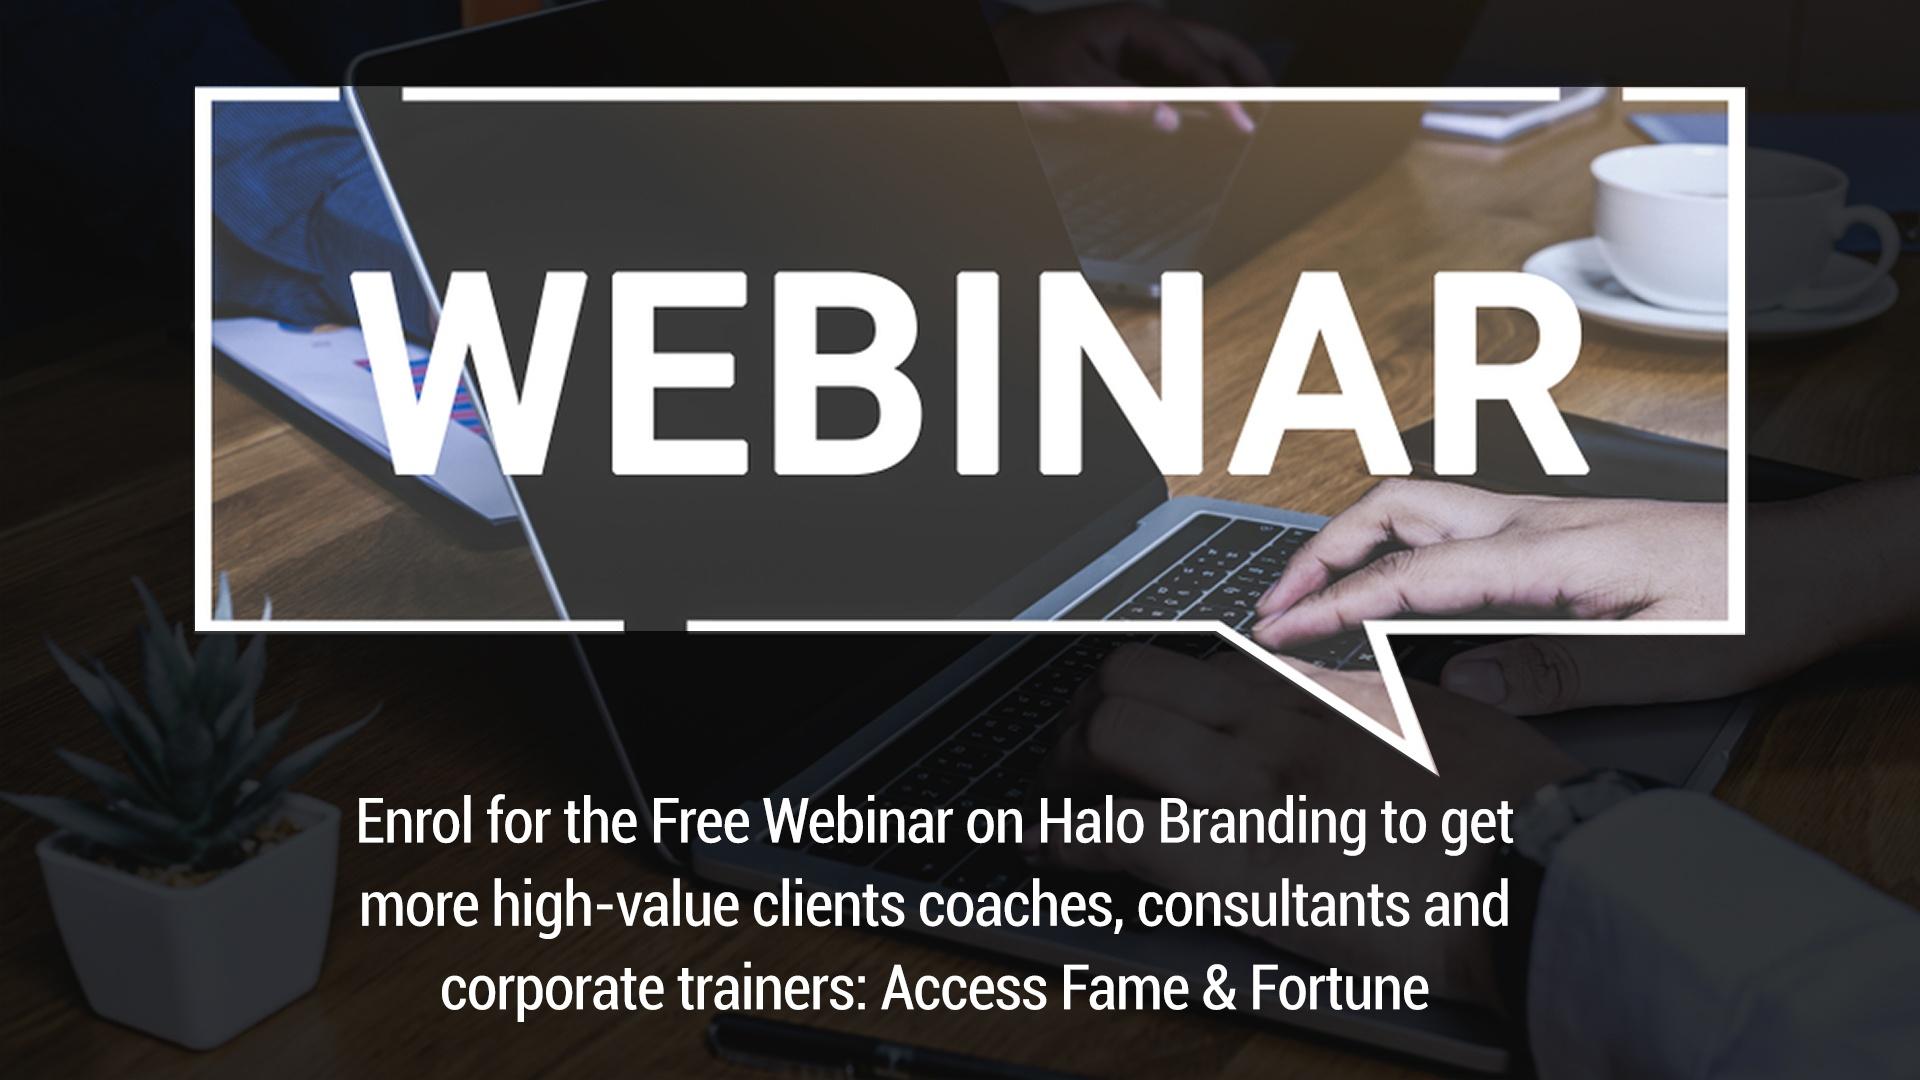 Halo branding free webinar